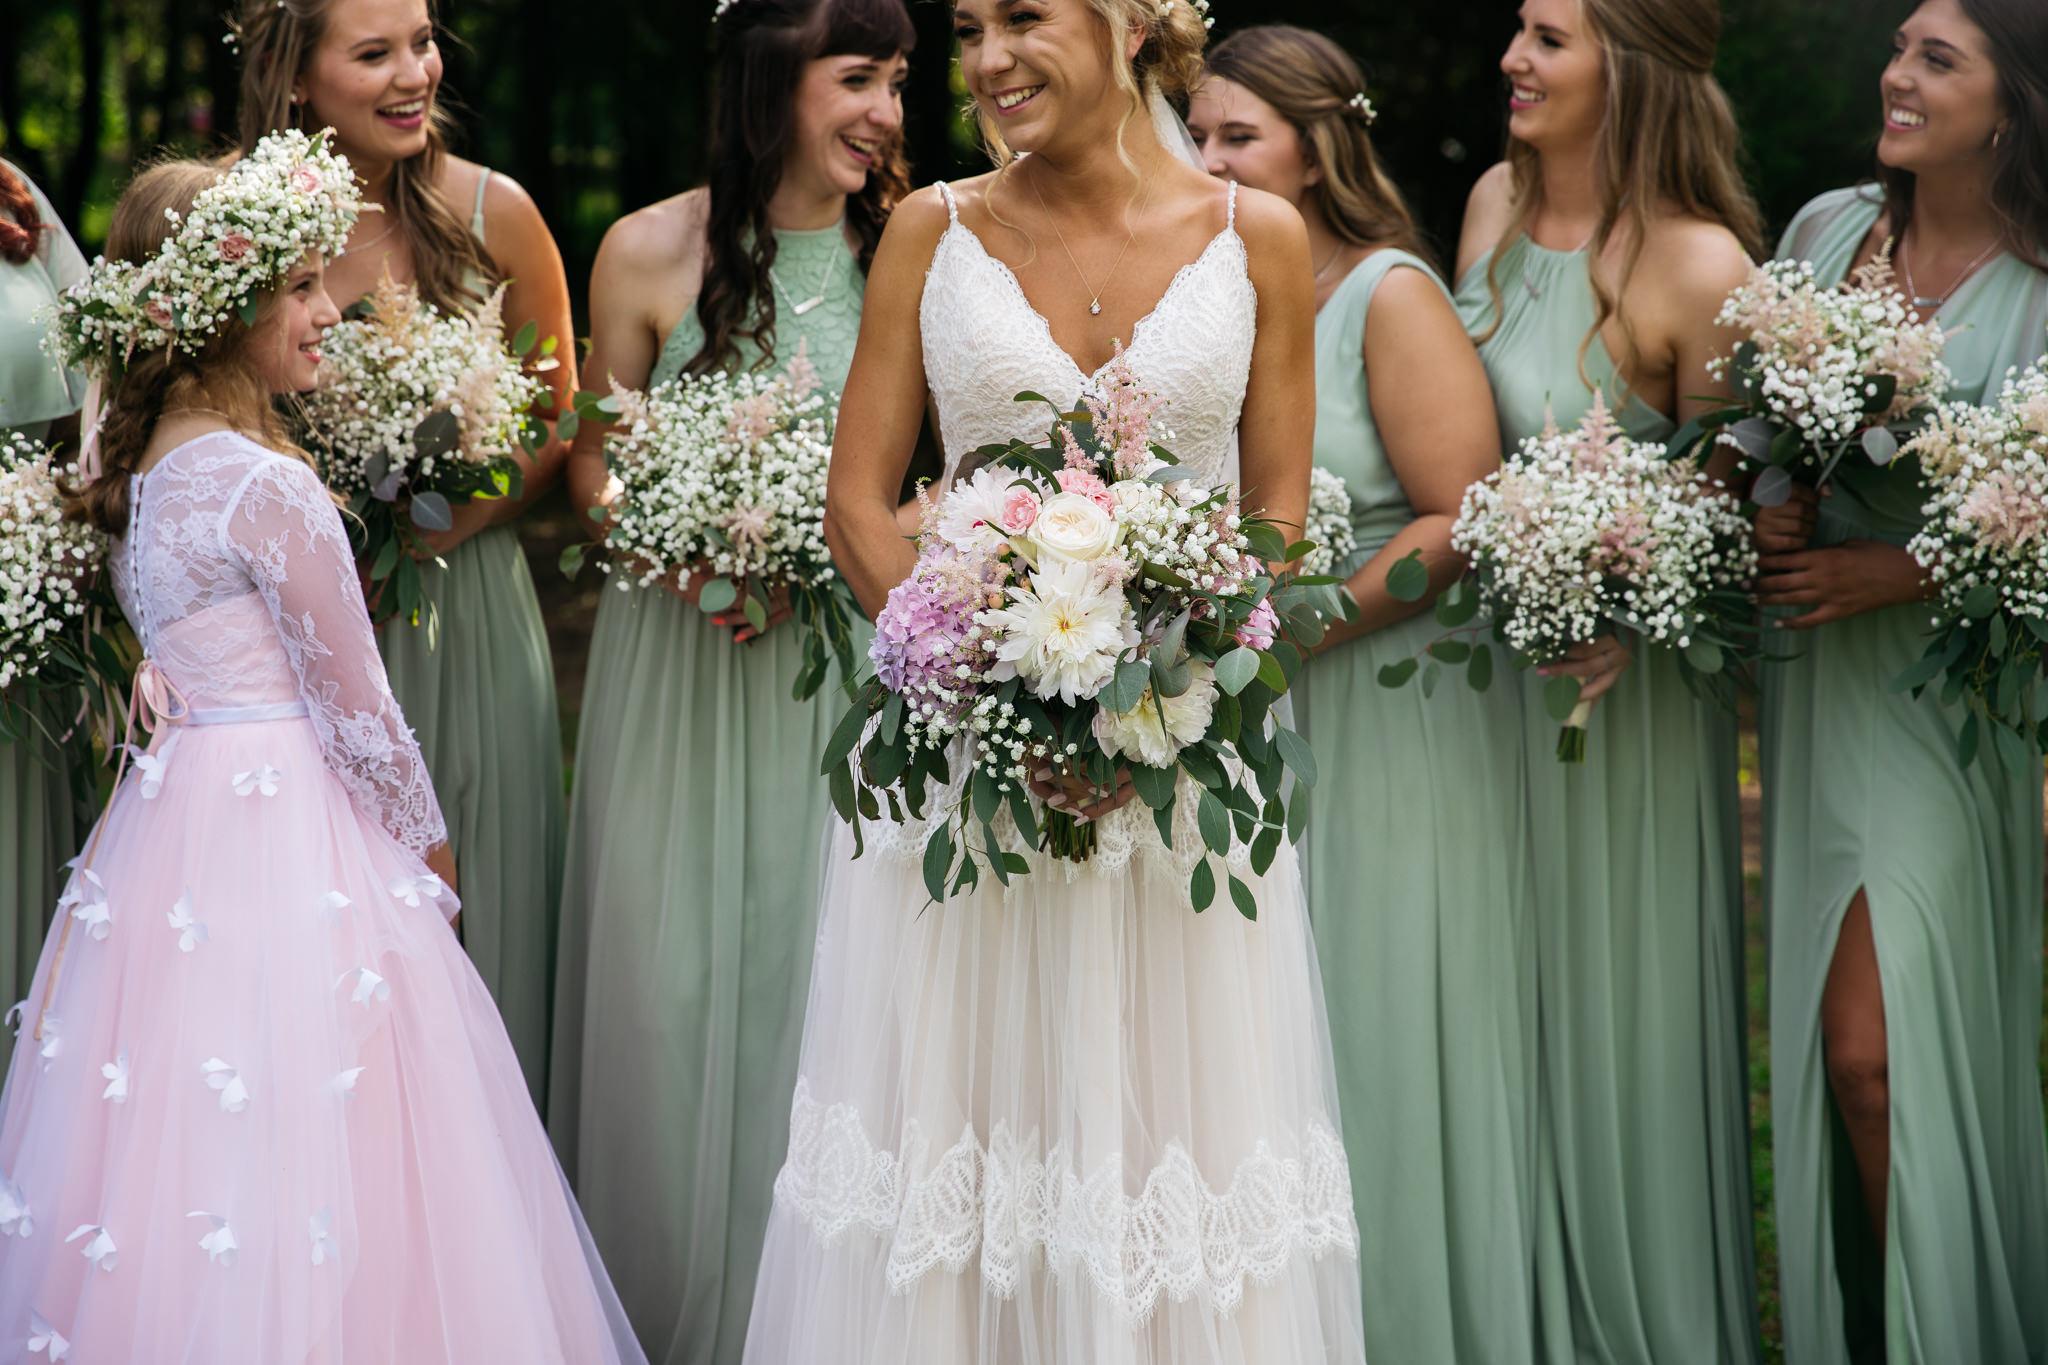 backyard-wedding-thewarmtharoundyou-lexy-branson-36.jpg